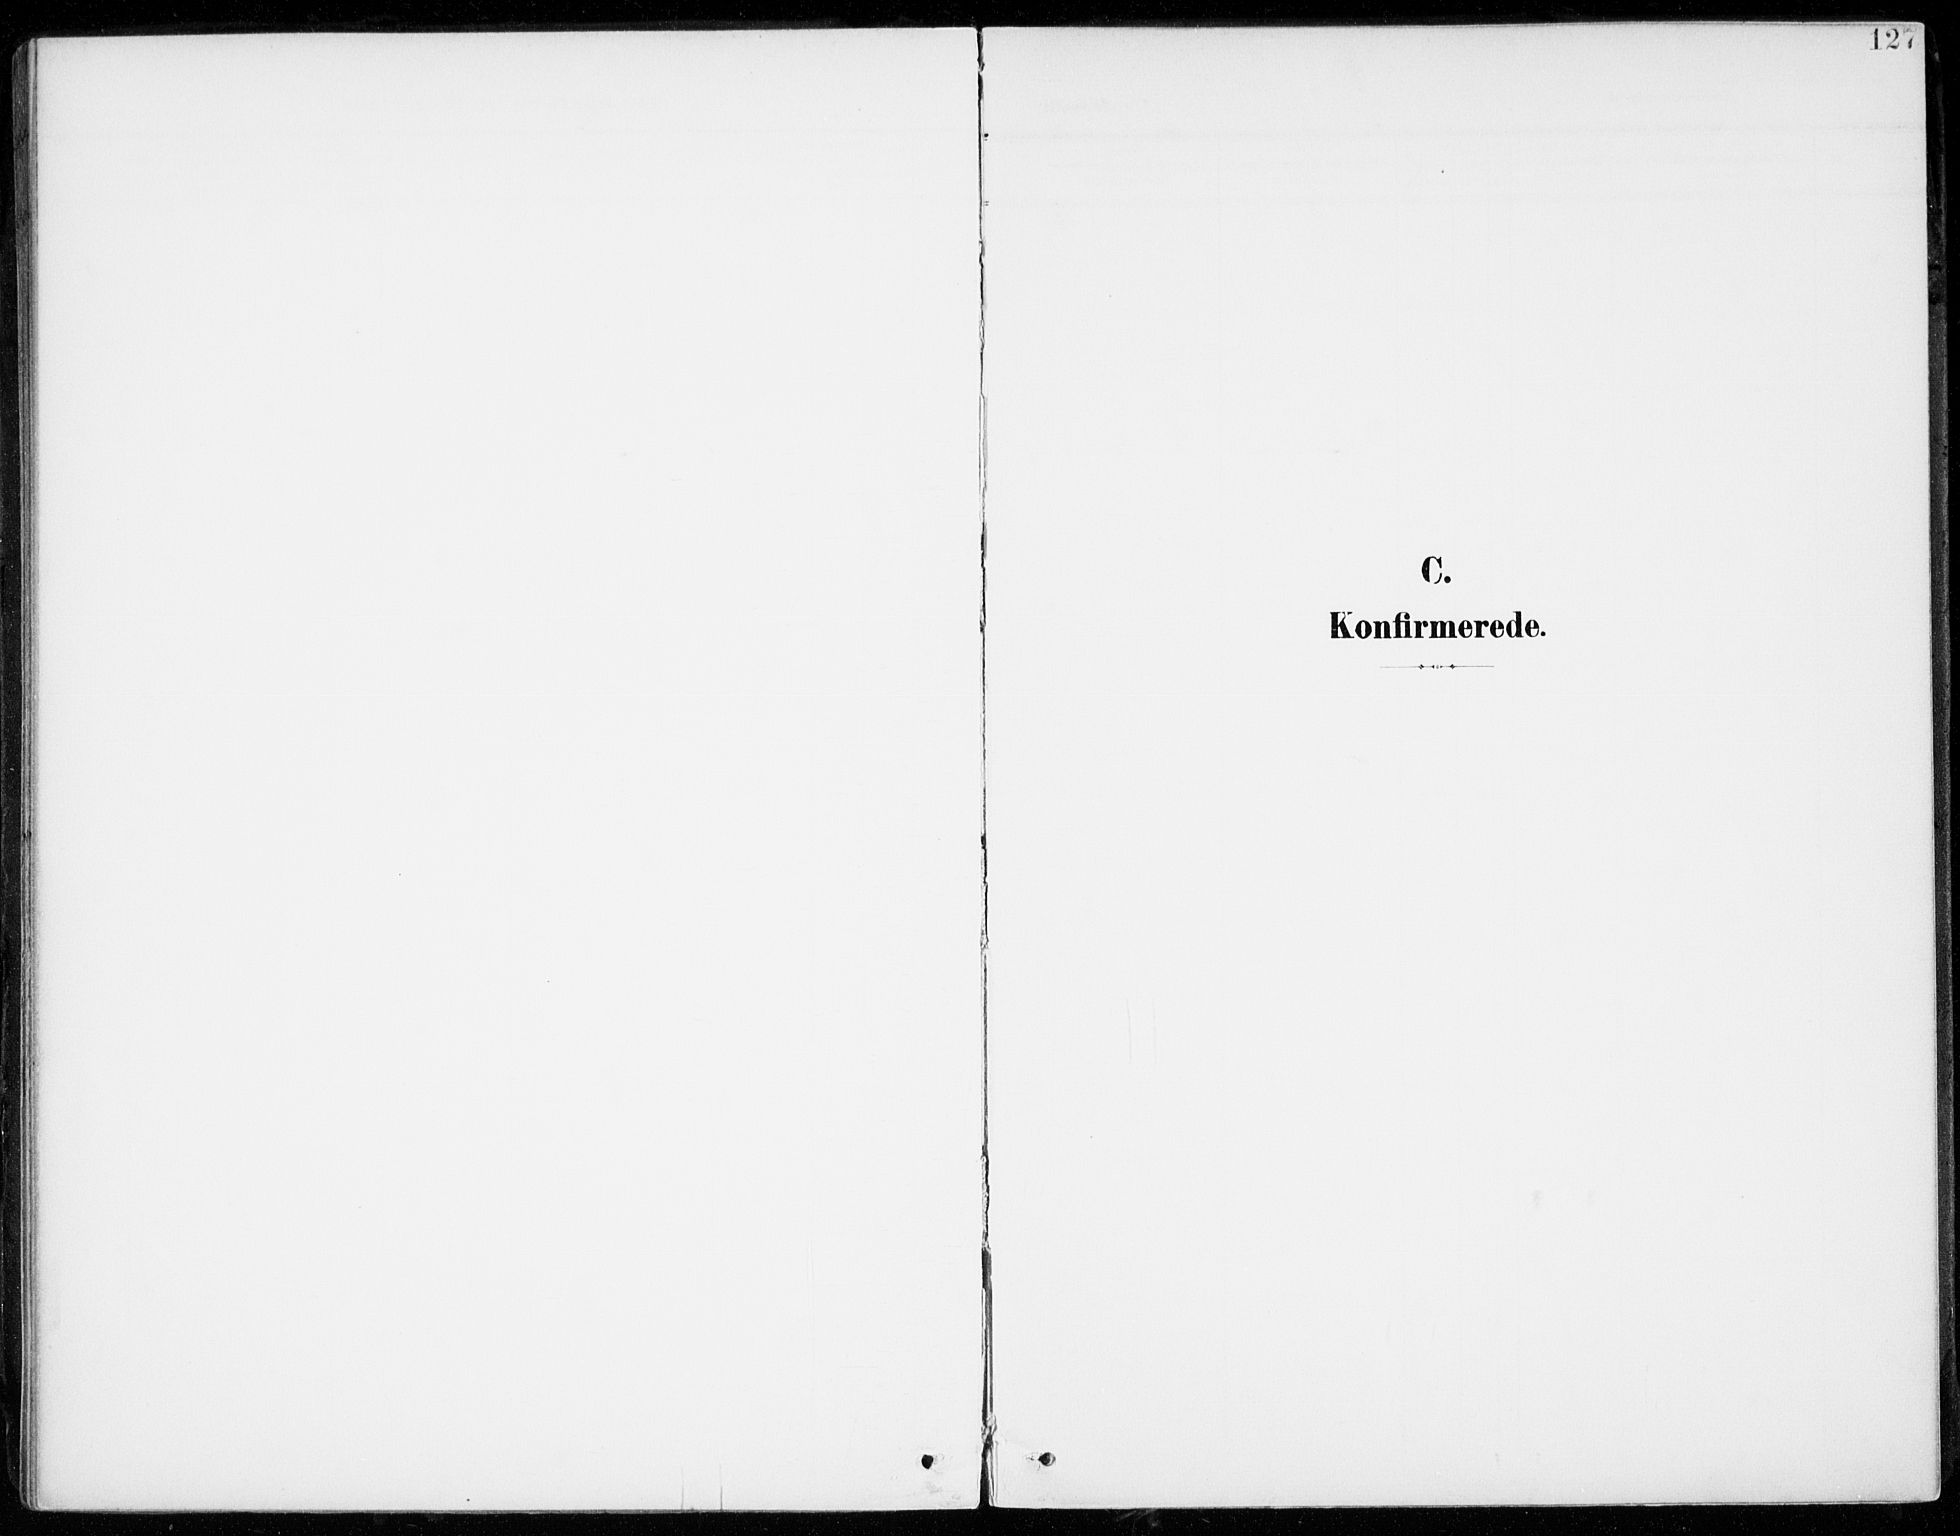 SATØ, Lenvik sokneprestembete, H/Ha: Ministerialbok nr. 14, 1899-1909, s. 127